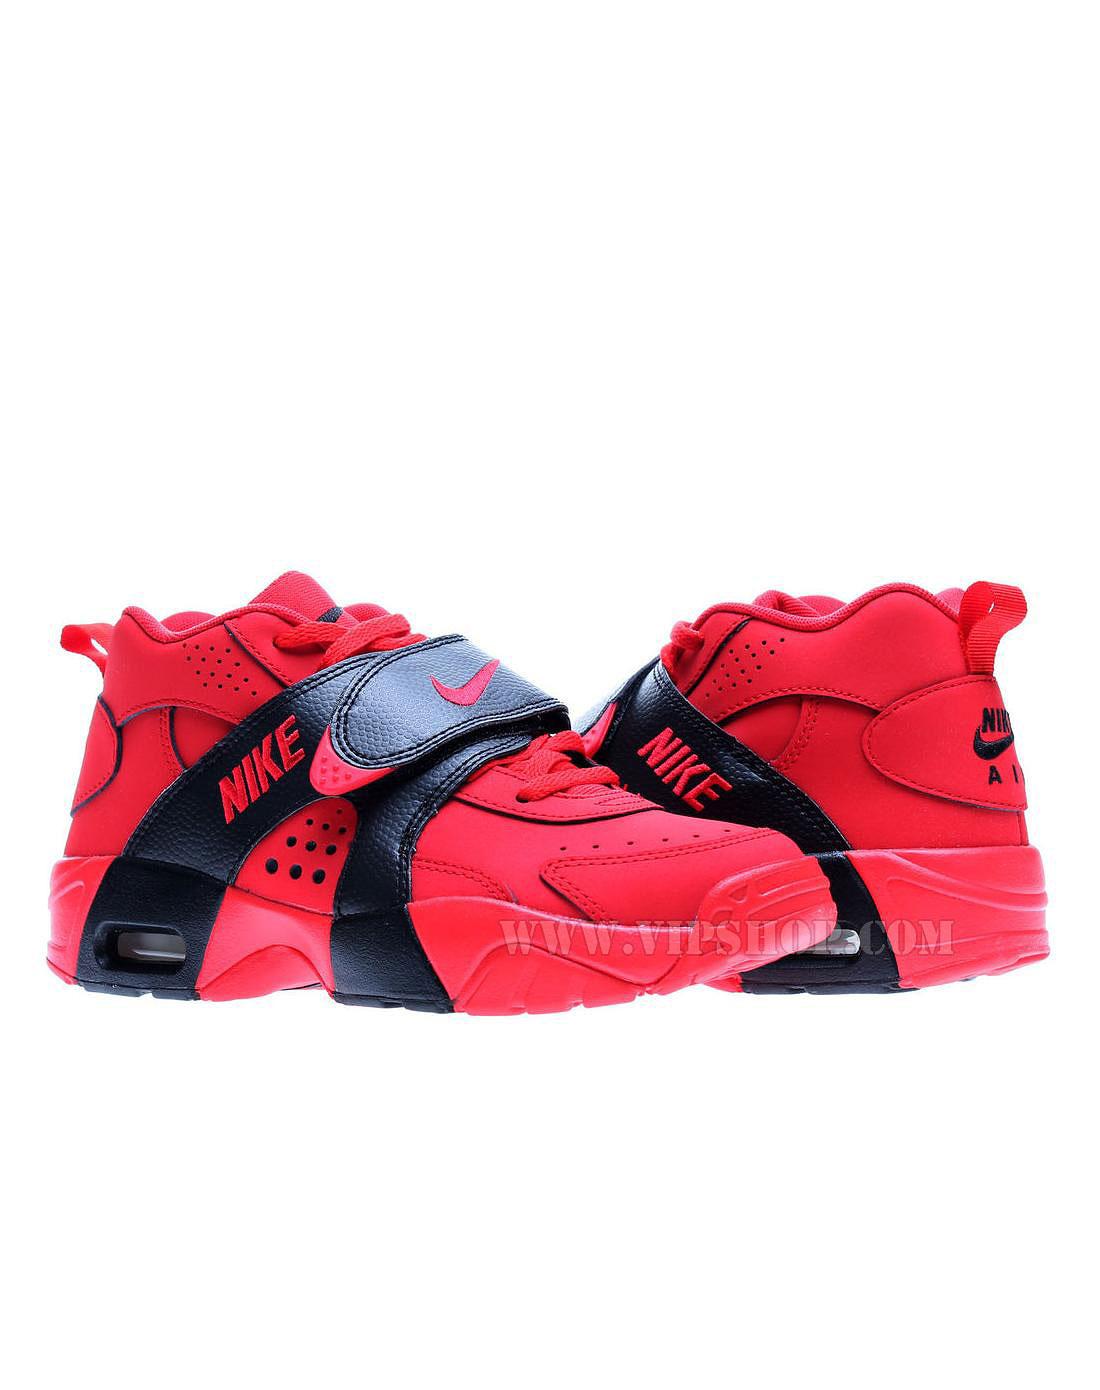 nike 大童运动鞋红/黑色